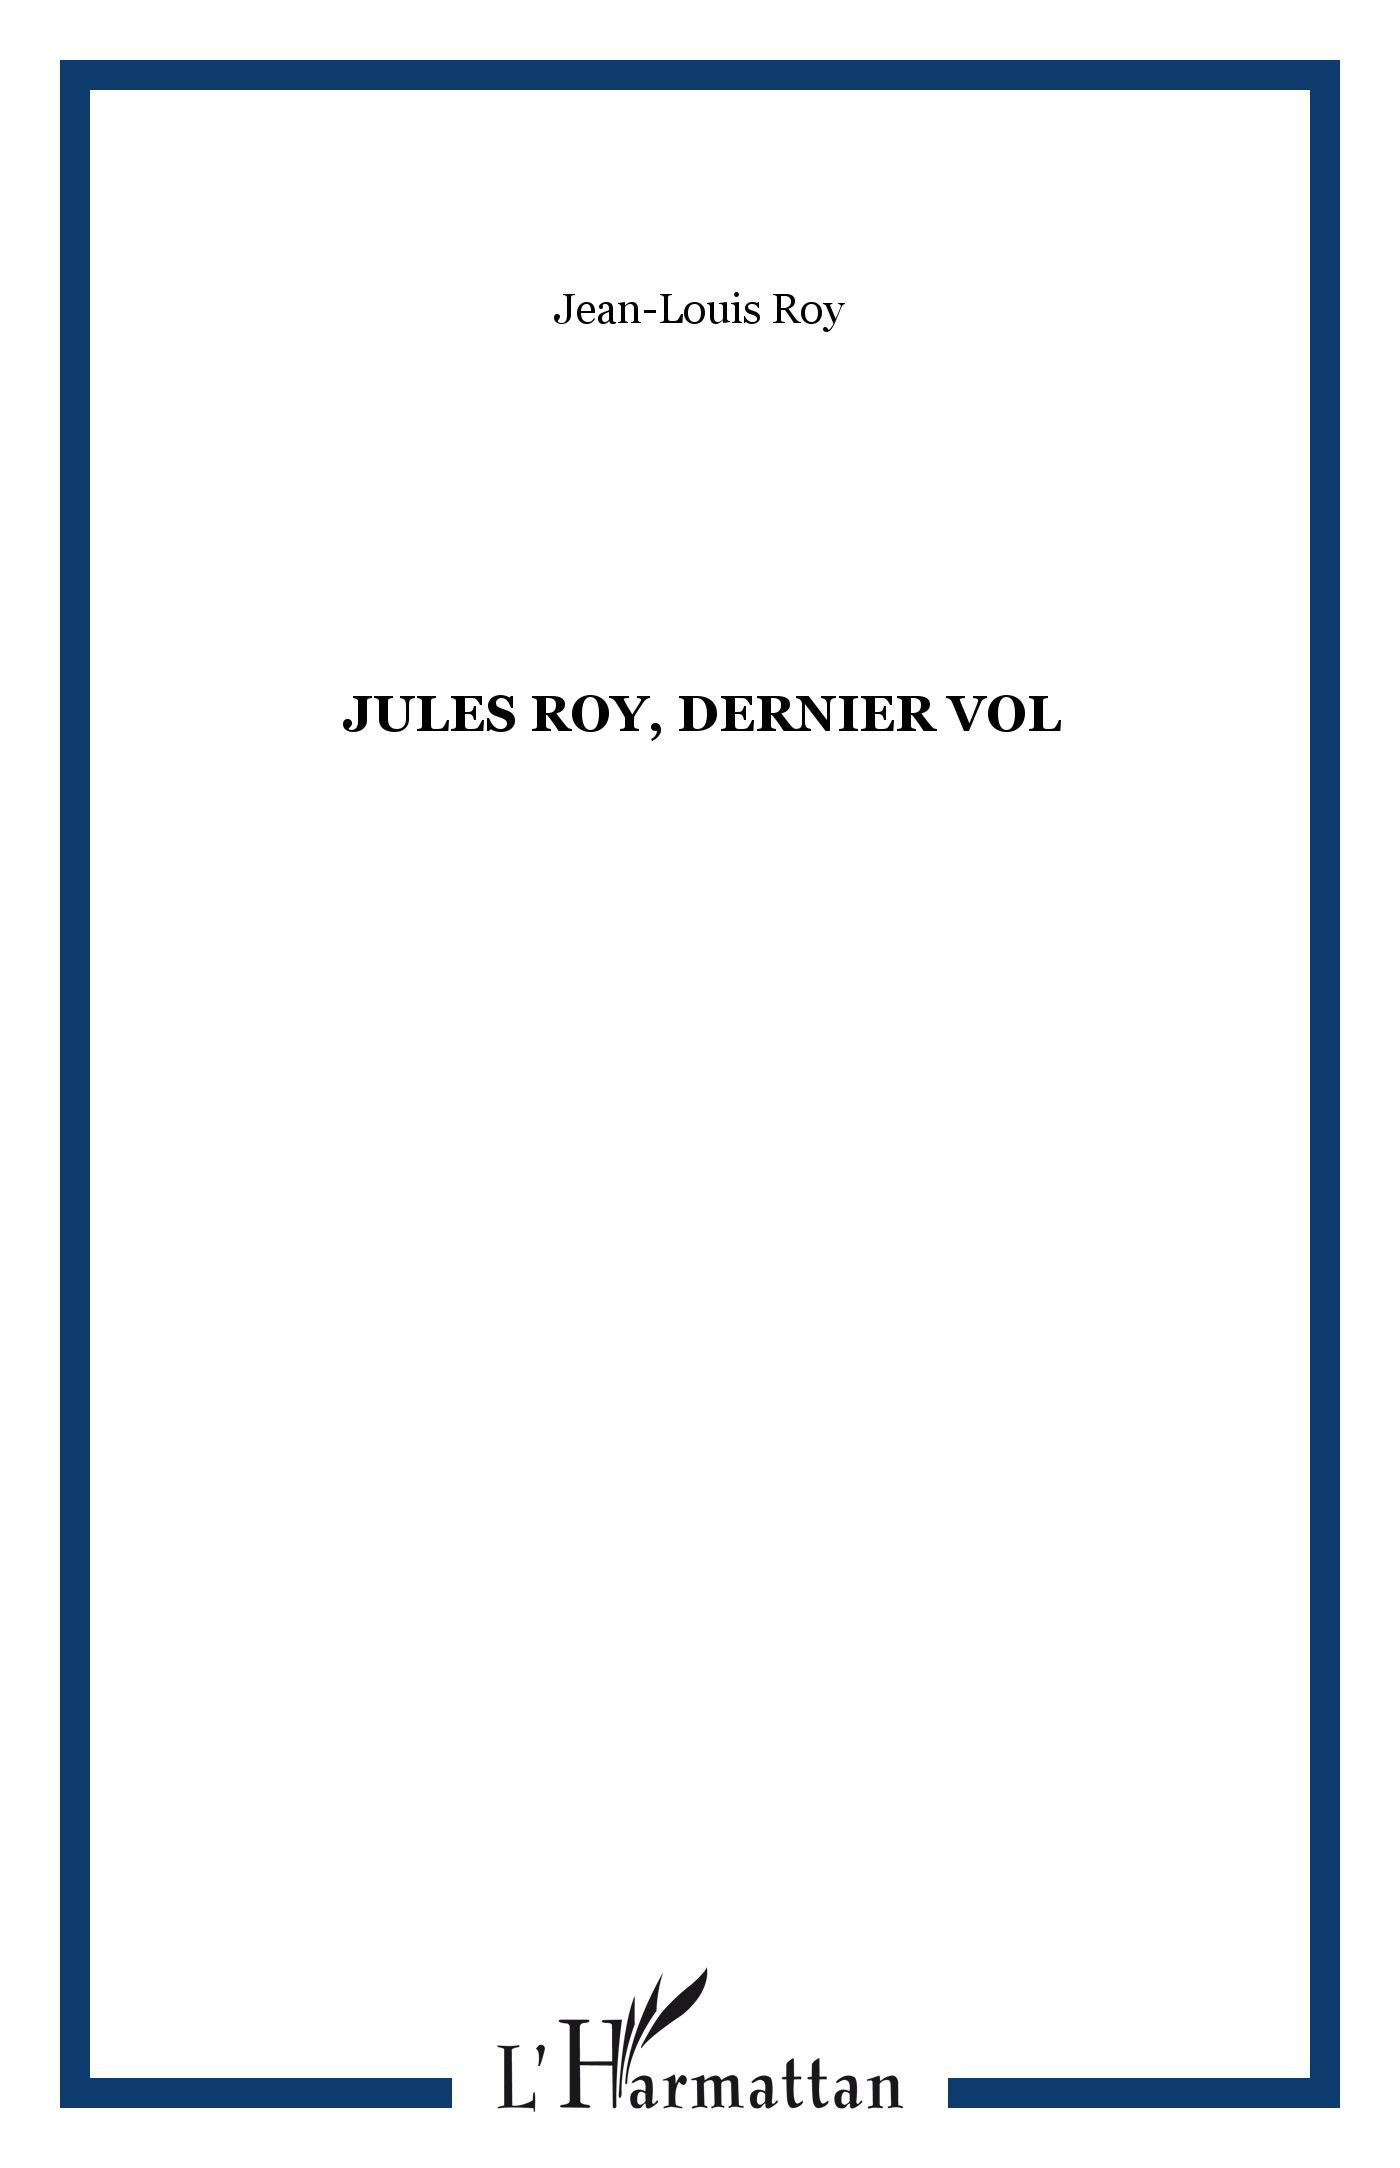 Jules Roy, dernier